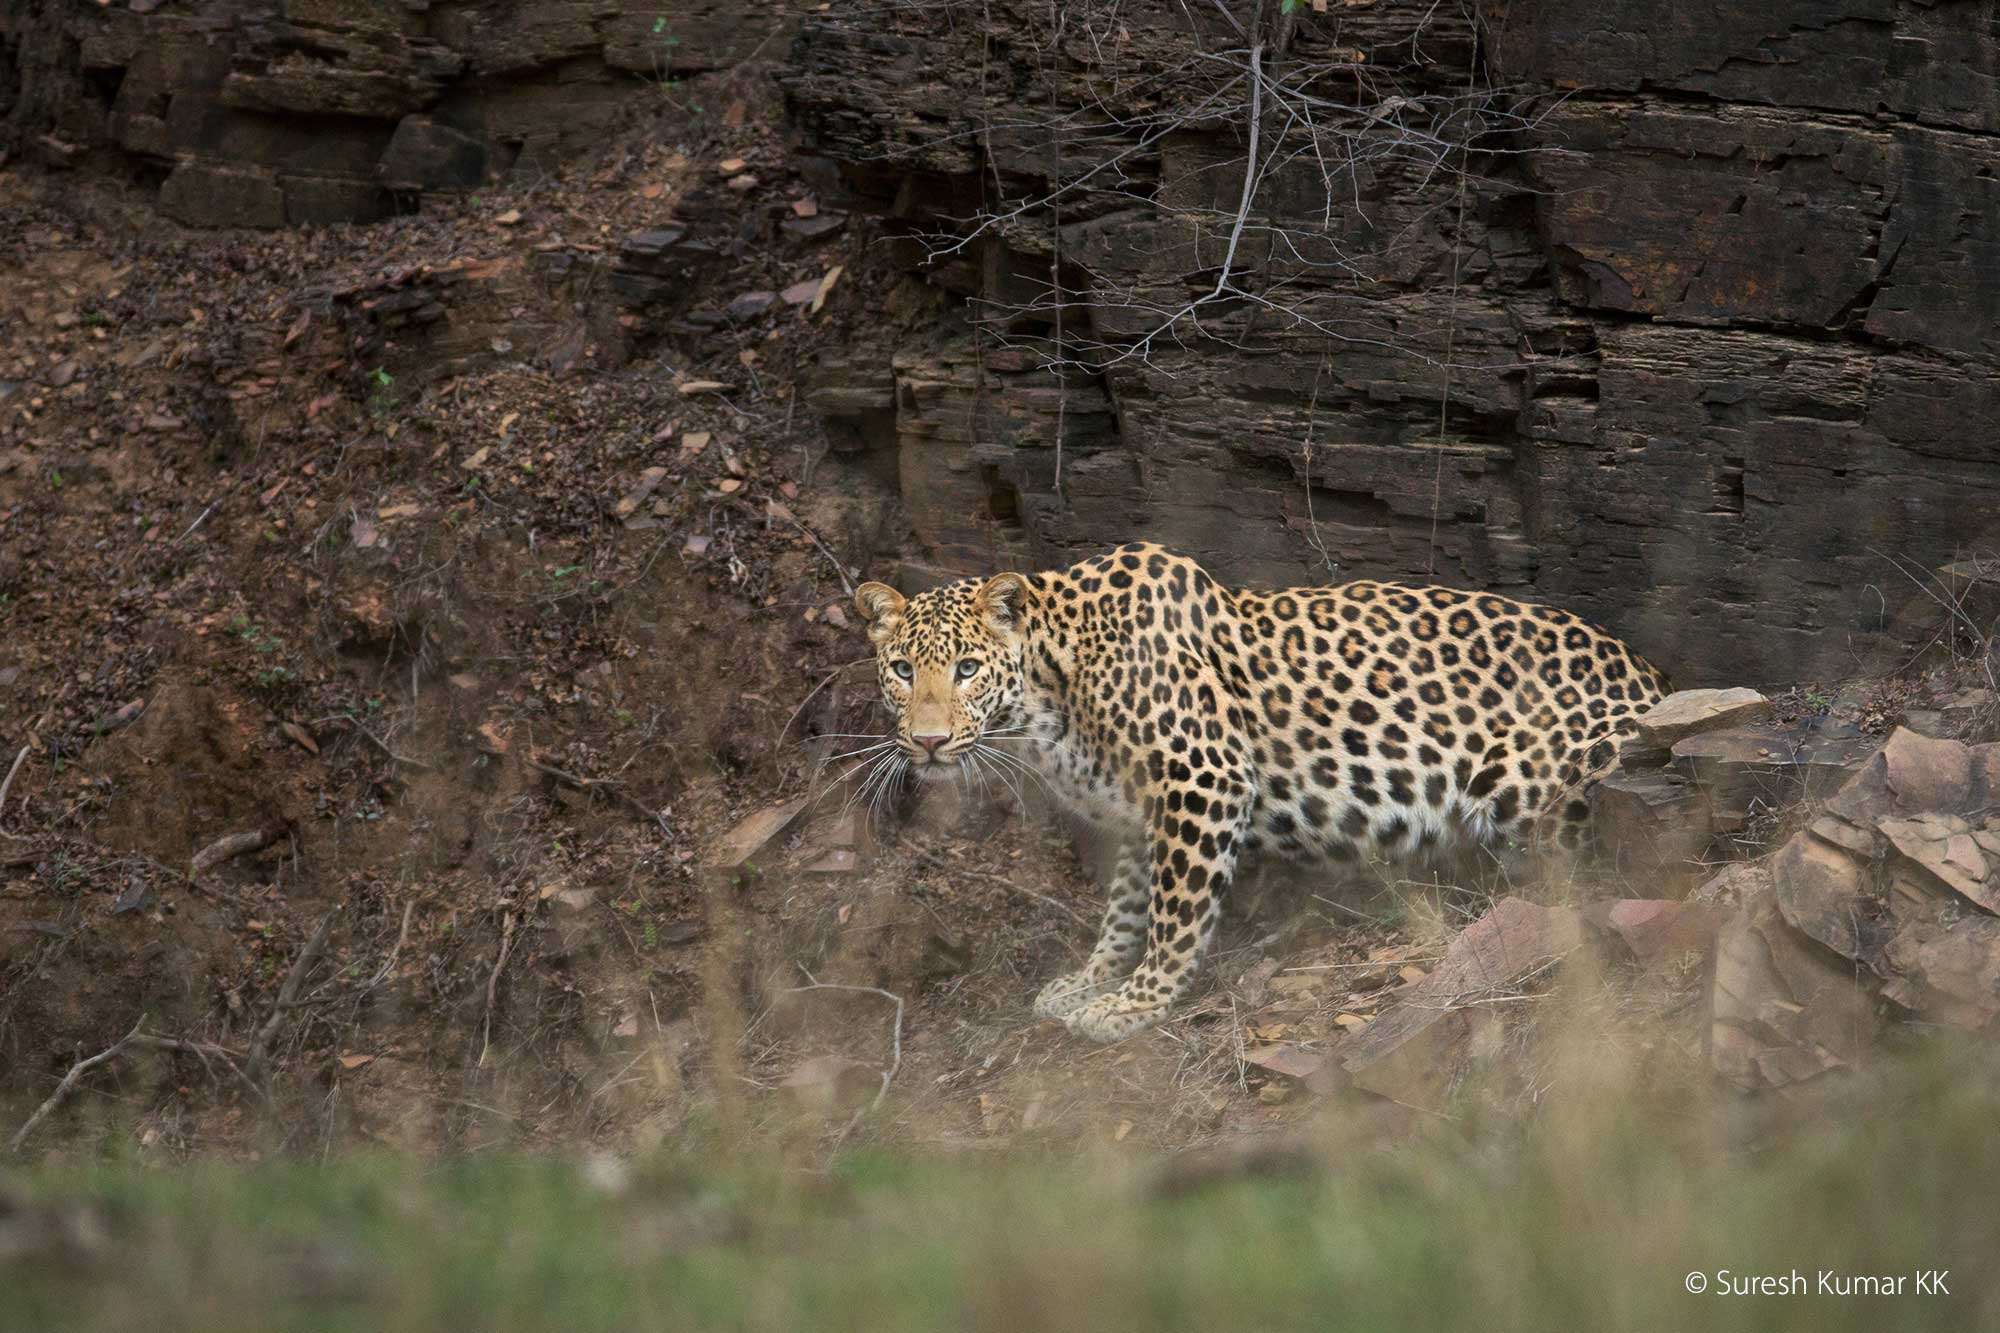 Leopard, Ranthambhore